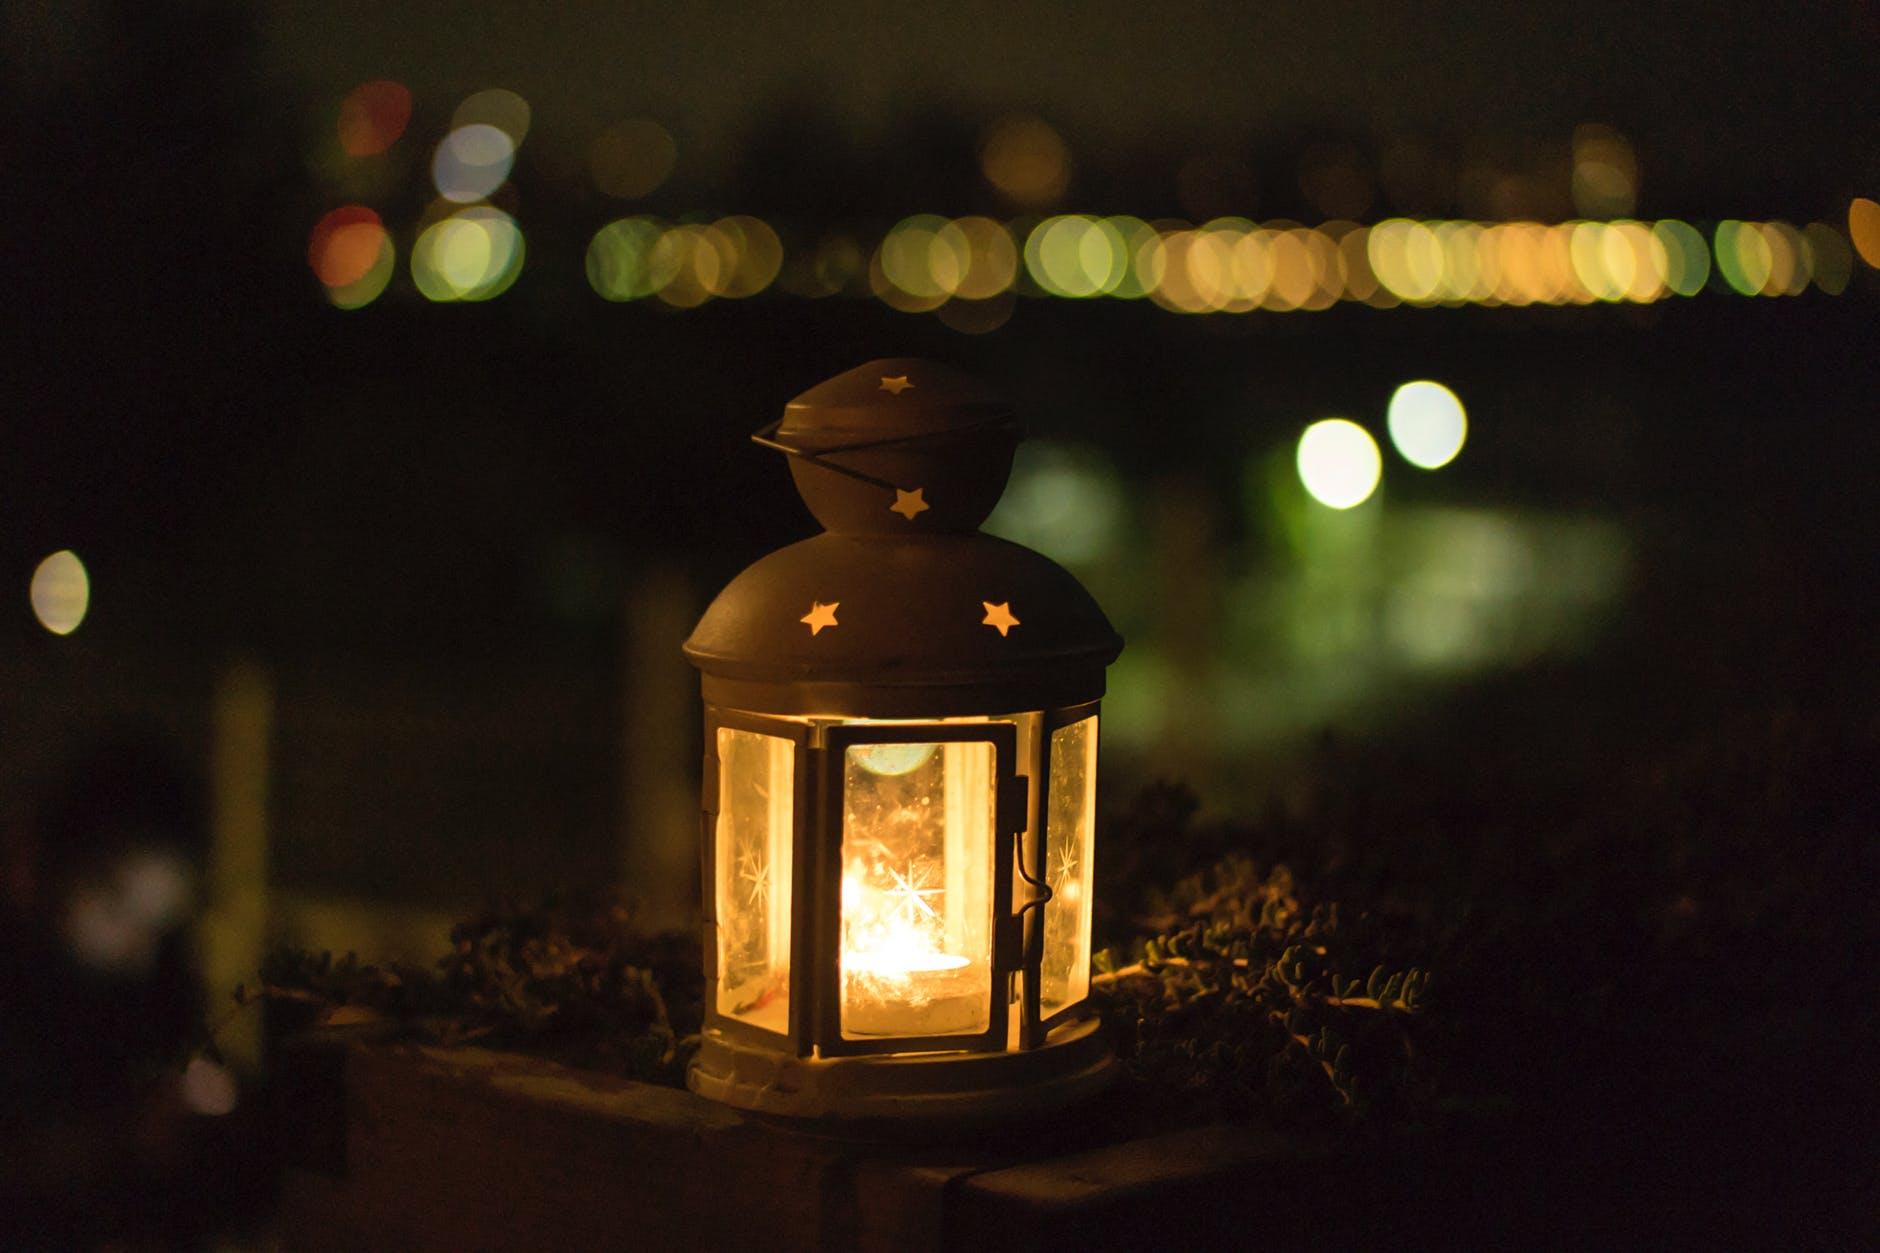 yellow lantern near body of water during night